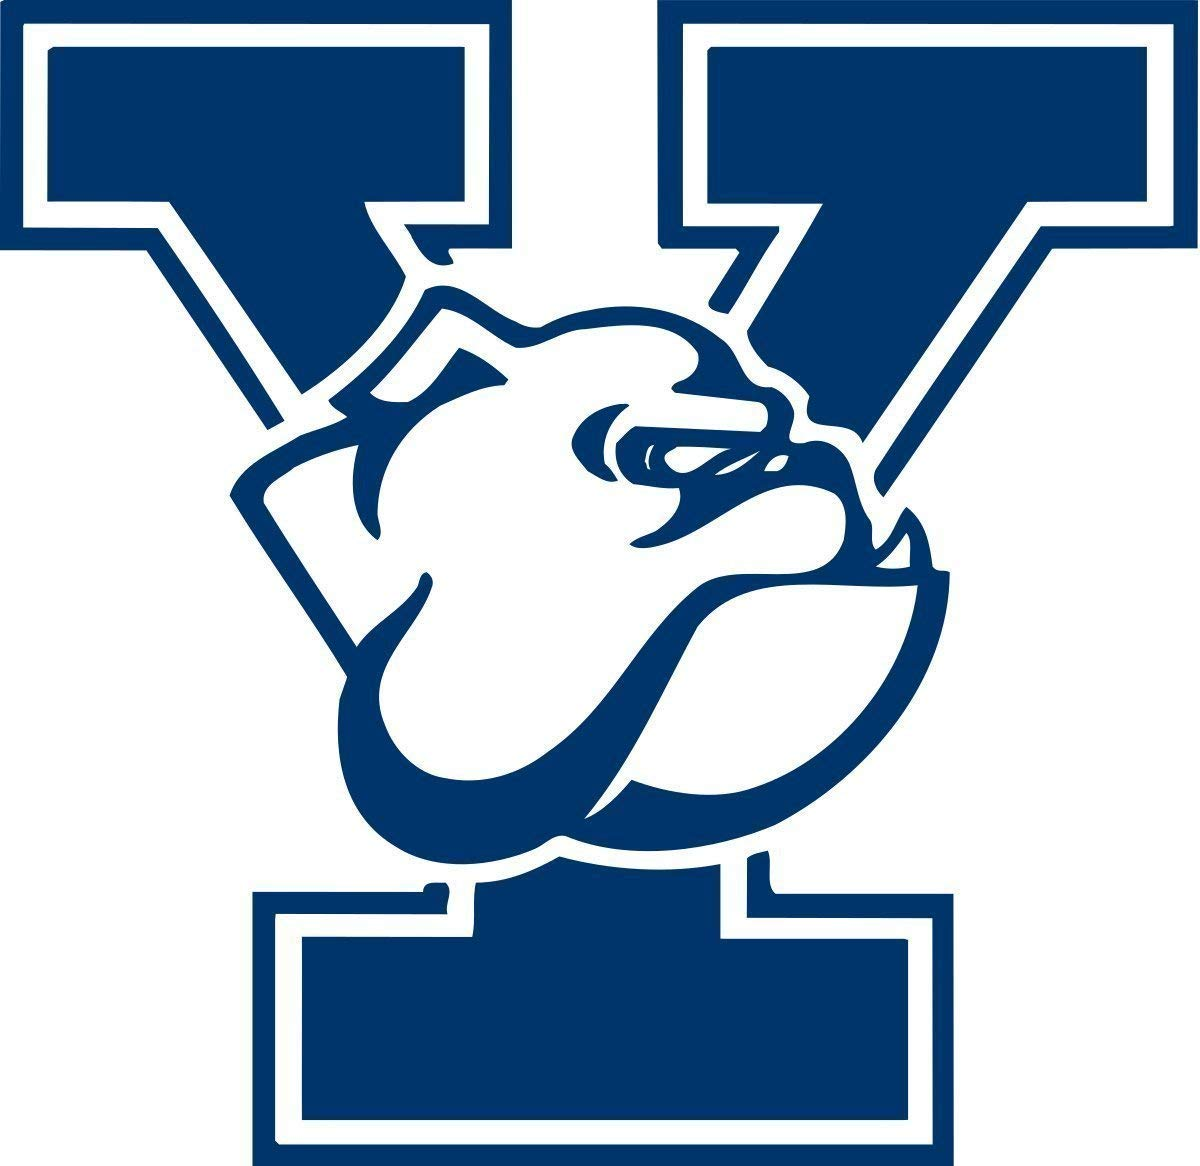 "Yale Bulldogs - Set of 2 or Single Premium Die-Cut 3"" Wide Vinyl Auto Decal or Laptops, Yeti, Gear, Best value"